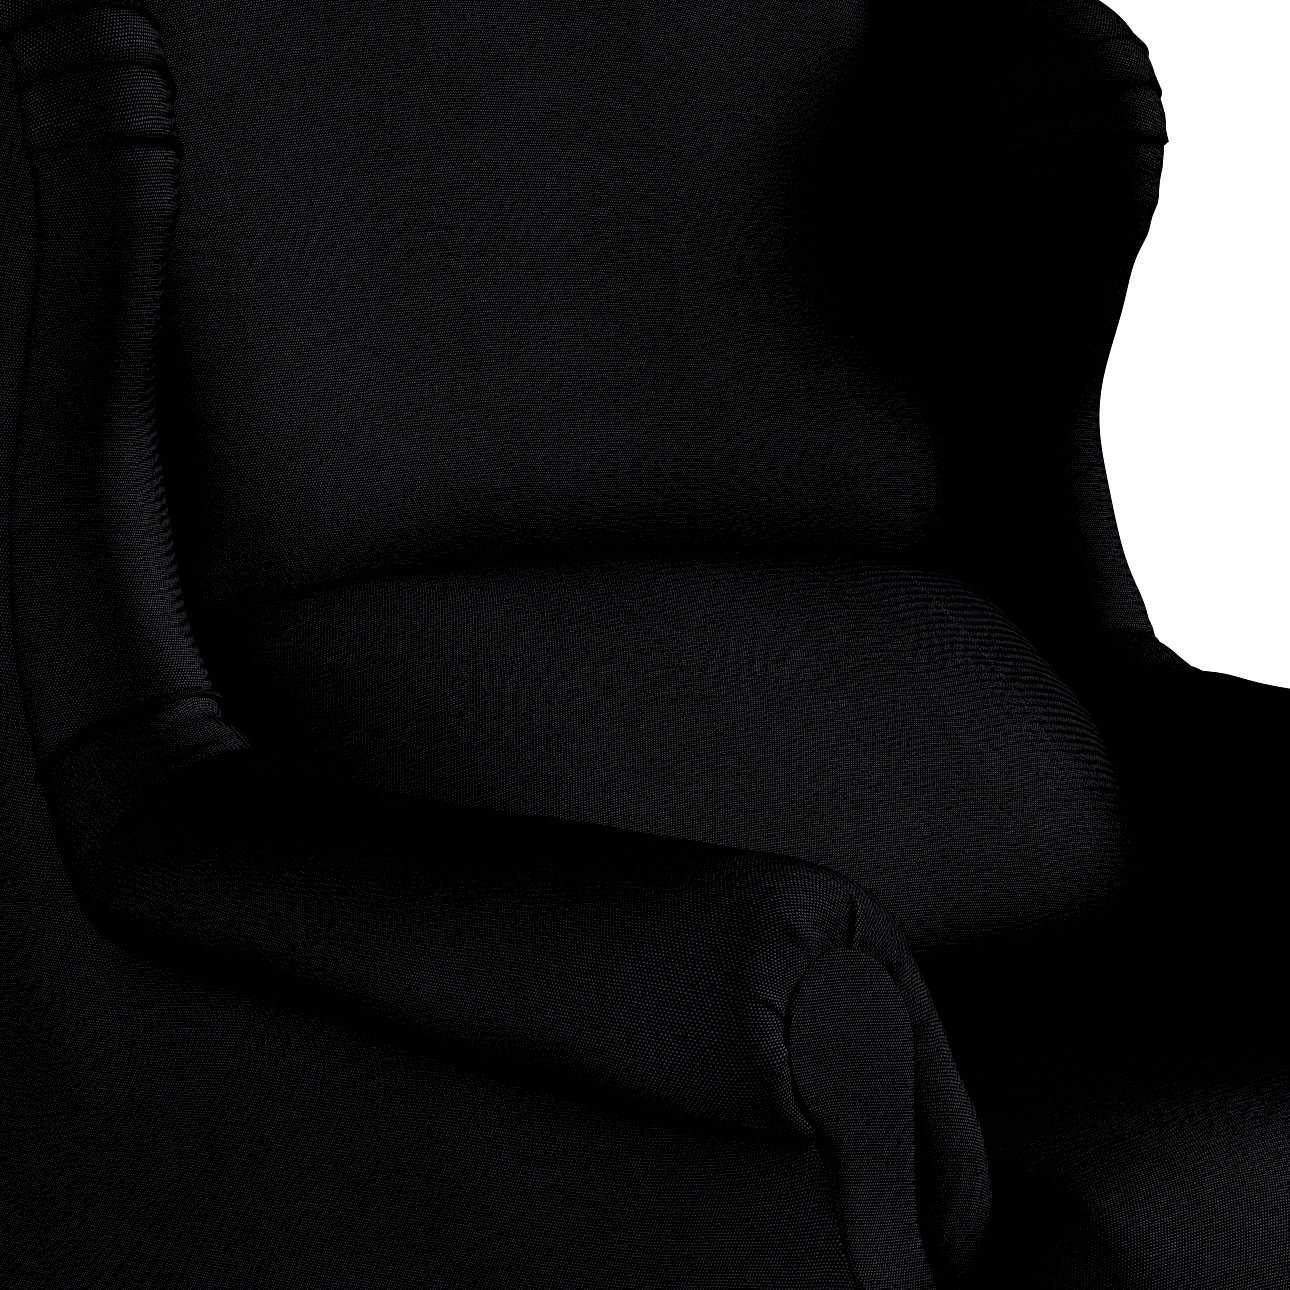 Fotel Unique w kolekcji Etna, tkanina: 705-00